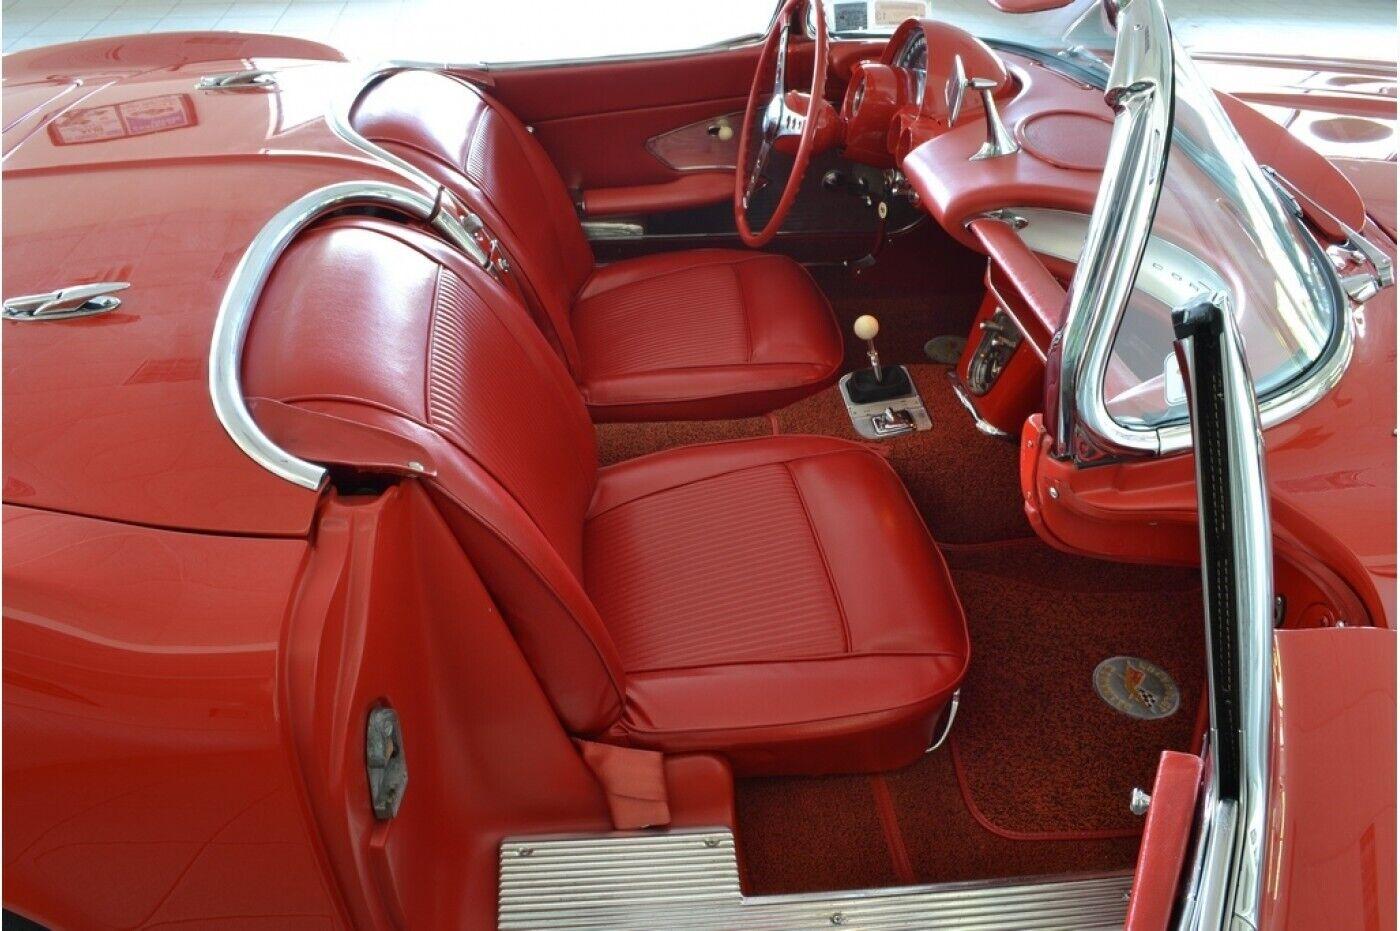 1961 Red Chevrolet Corvette   | C1 Corvette Photo 5